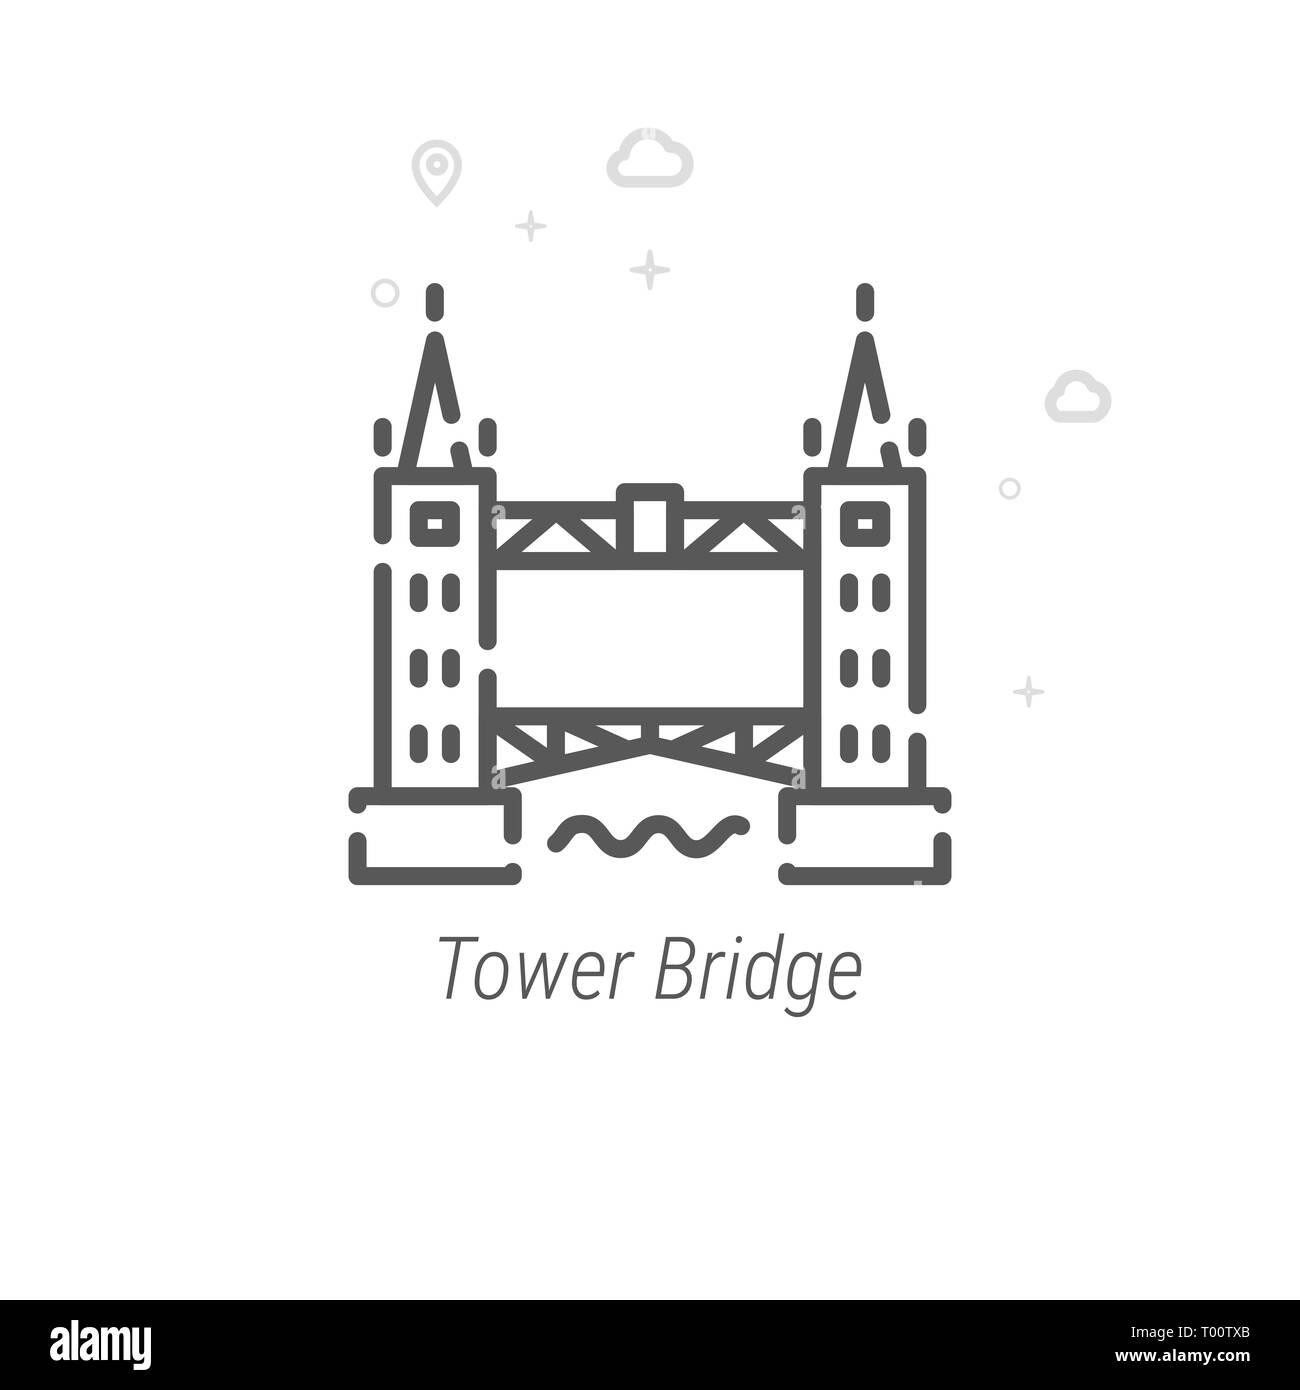 Tower Bridge, London Line Icon. Historical Landmarks Symbol, Pictogram, Sign. Light Abstract Geometric Background. Editable Stroke. Adjust Line Weight - Stock Image